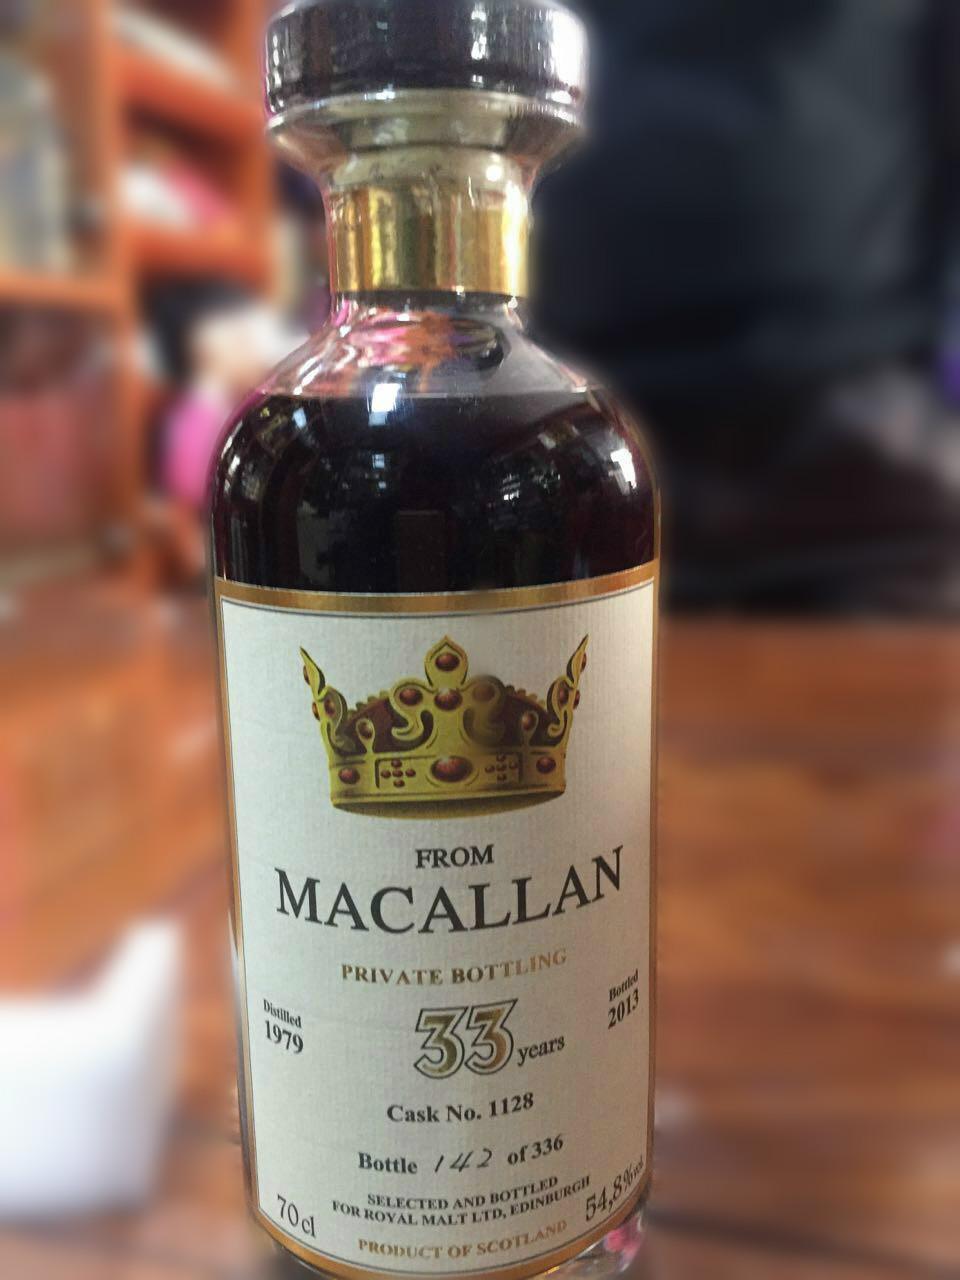 Fake Macallan sold in China